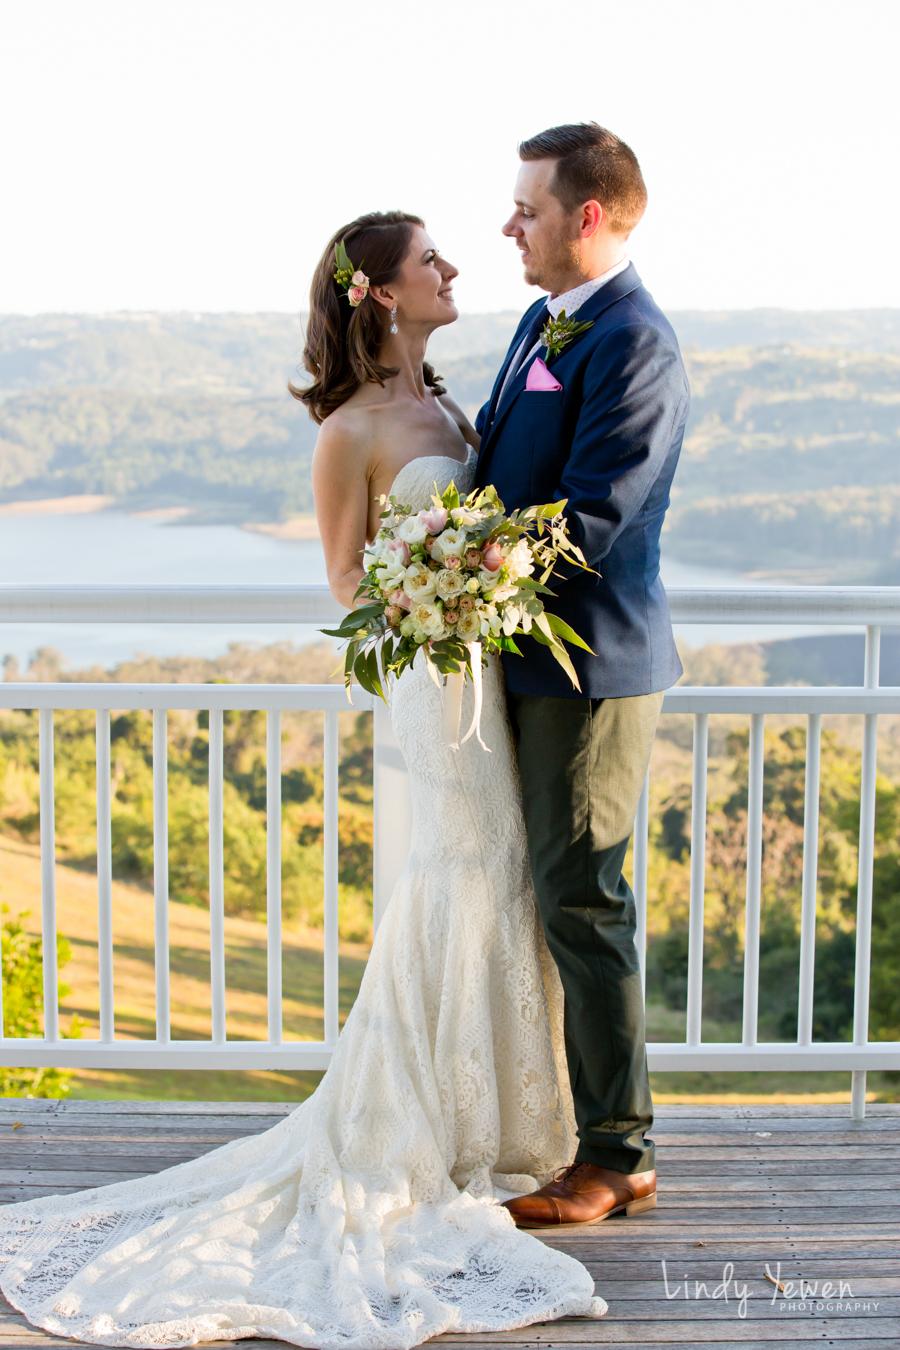 Montville-wedding-photographer-Lauren-Kirby 528.jpg